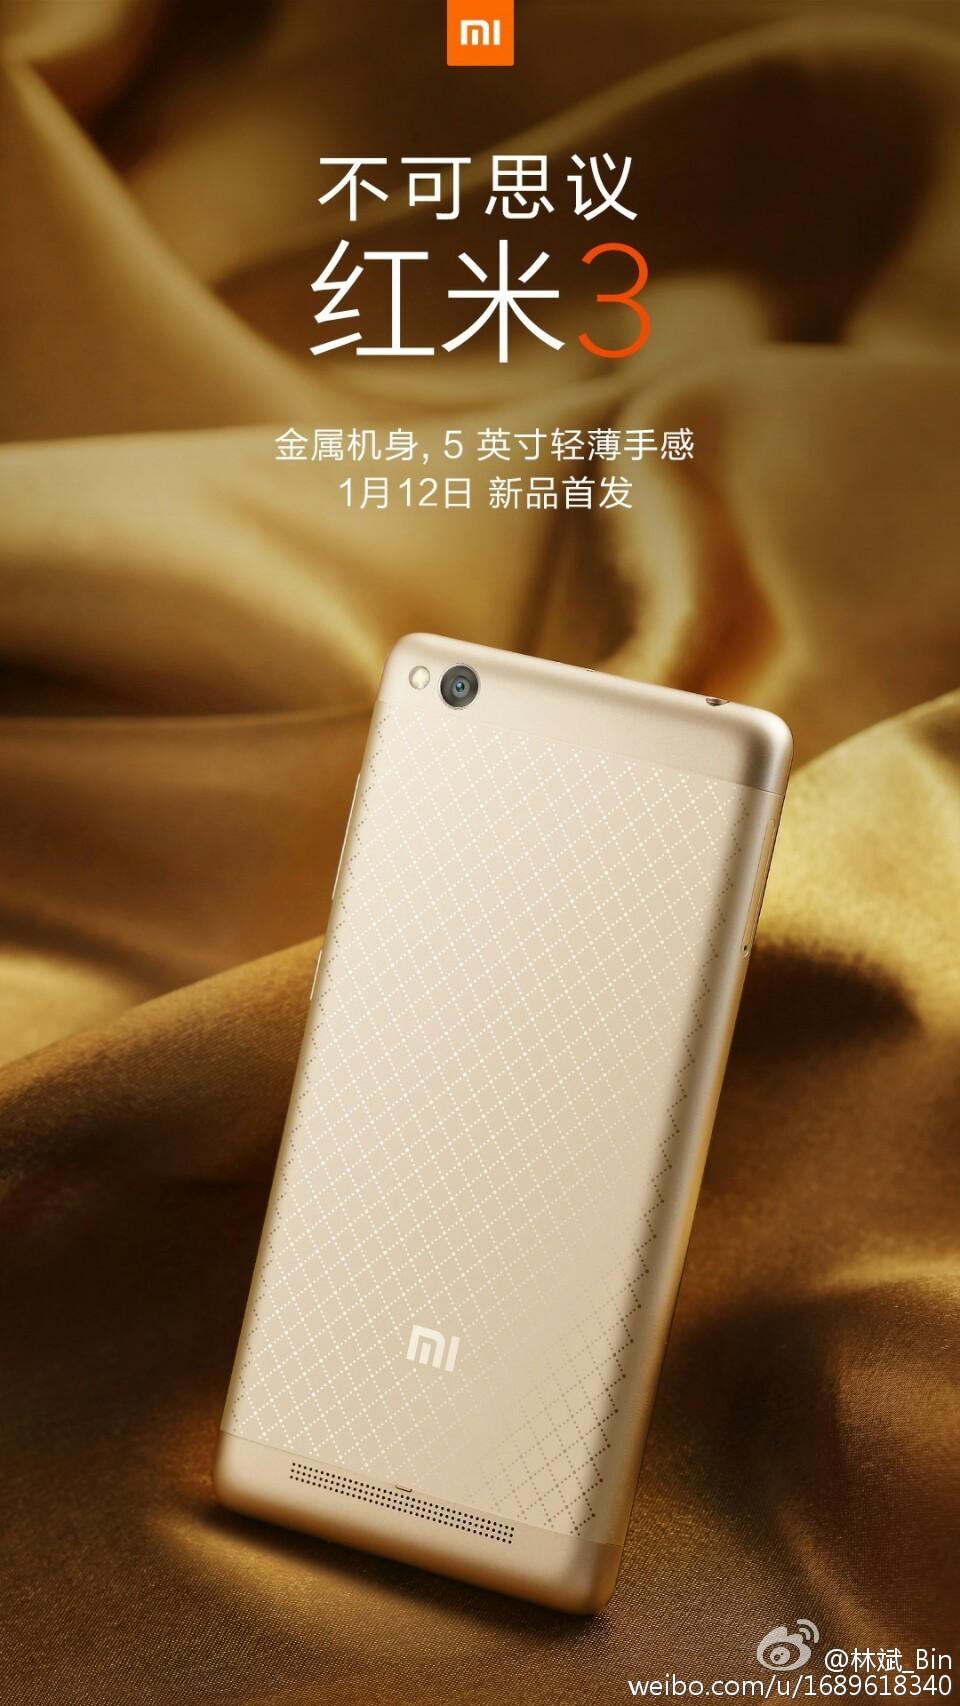 Xiaomi Redmi 3 To Launch On 12 Jan Full Metal Body 5 Inch Display Xiaomiredmi 105633ddvzc2ivcdx1ii2g 104247njhtvej5h9zjg9tg